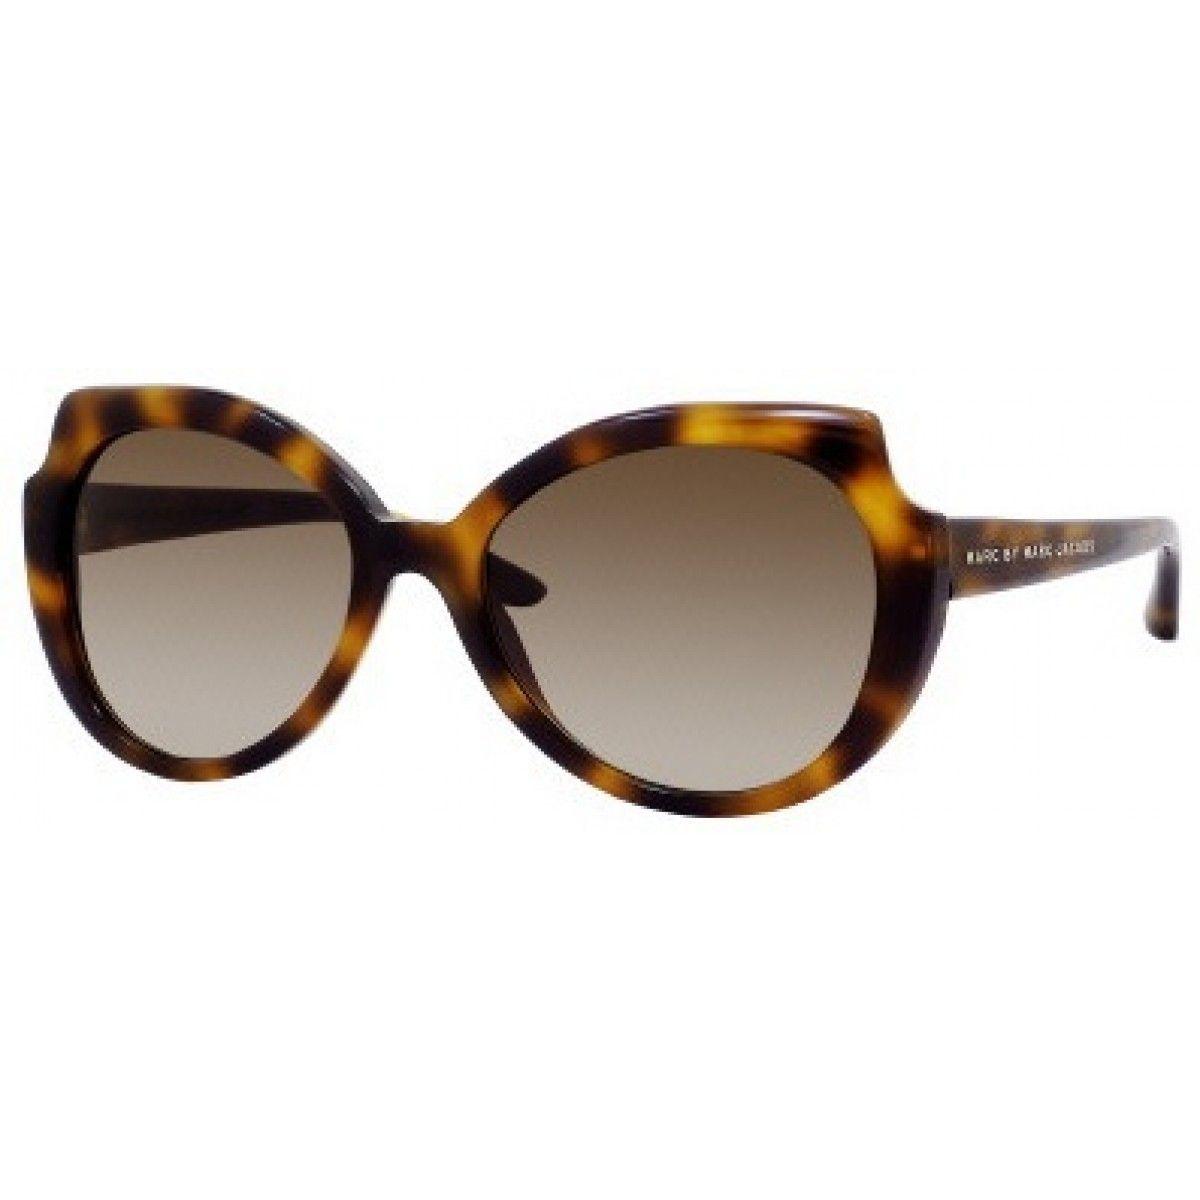 Marc by MJacobs Sunglasses MMJ 262/S-31 - Eyeglass.com #womens ...